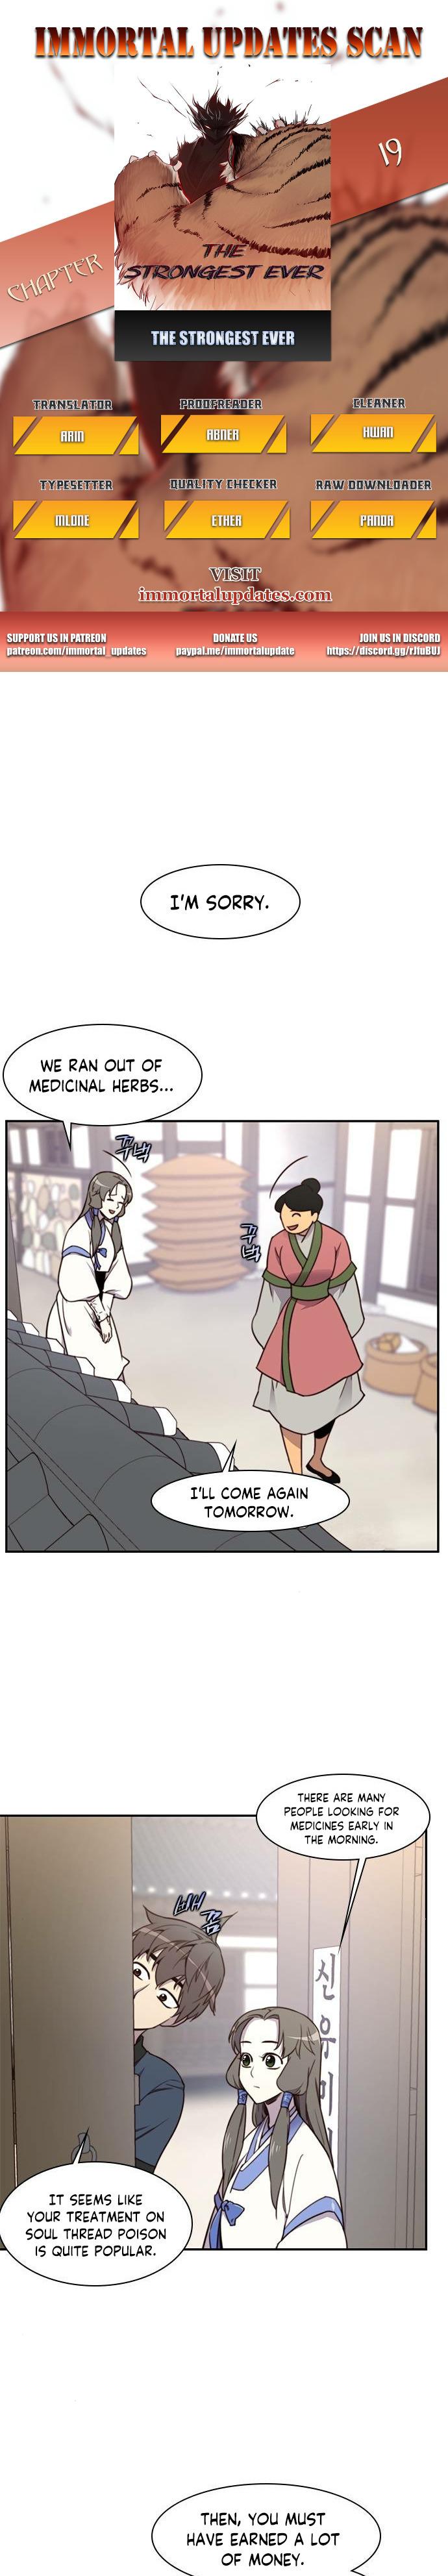 https://manga.mangadogs.com/comics/pic4/12/44428/2879027/f5b4cb07dffbda7cc3a5d33bee7183e9.jpg Page 1